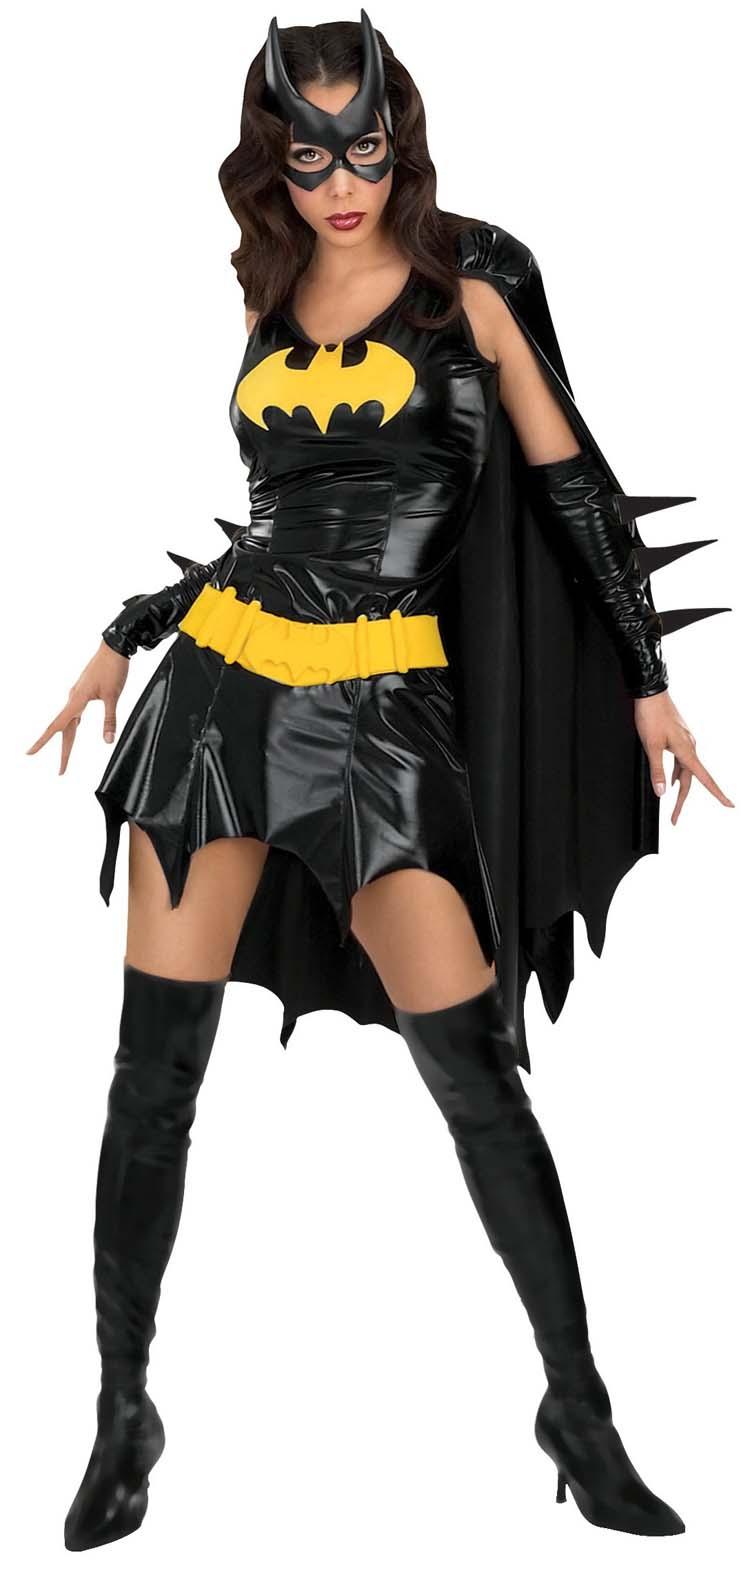 09-sexy-batgirl-adult-costume